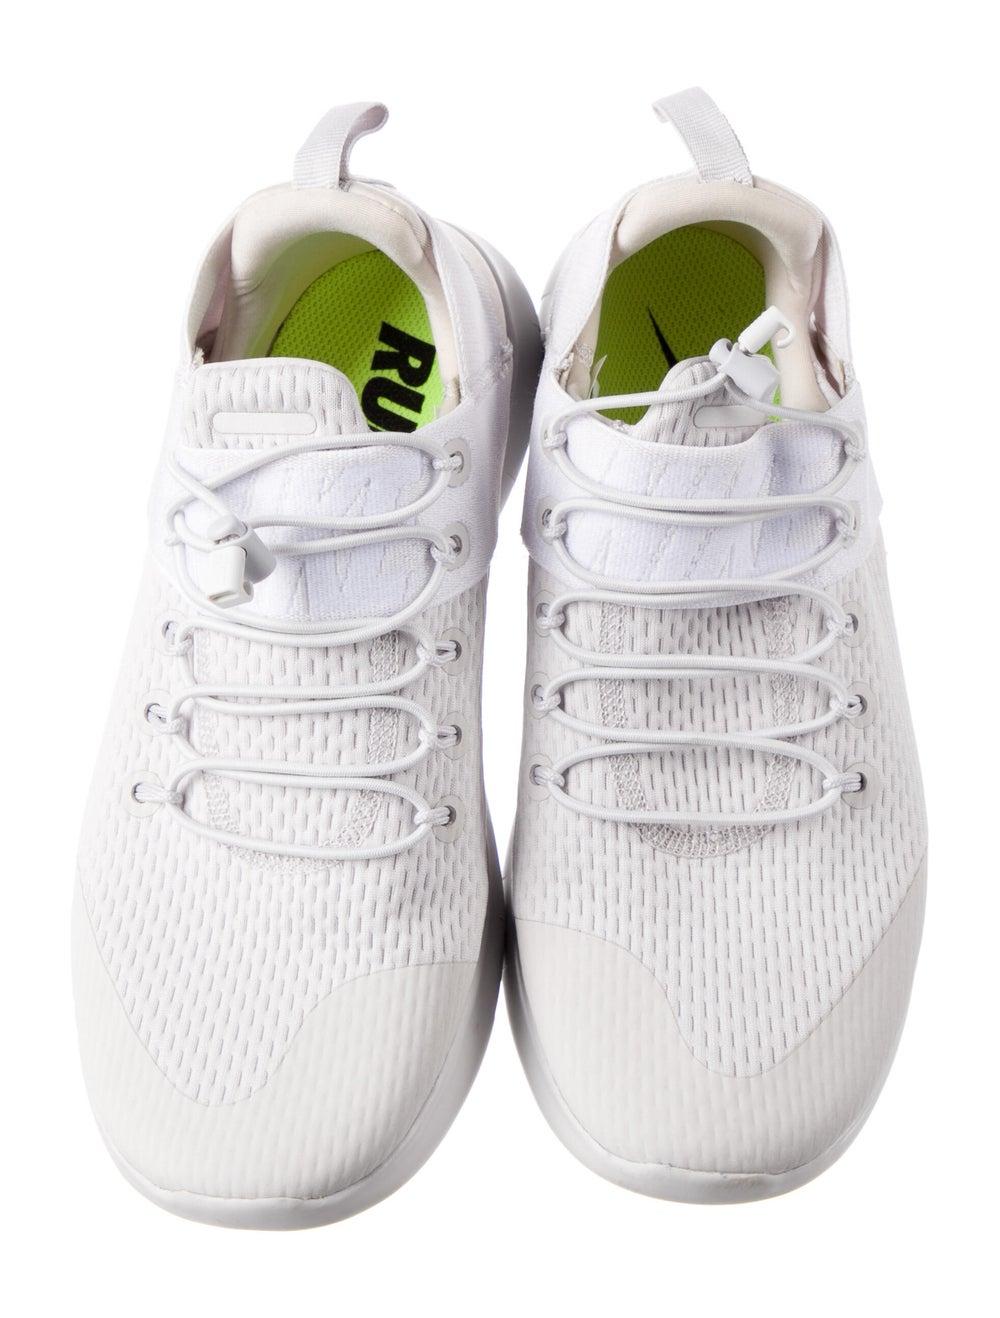 Nike Sneakers White - image 3